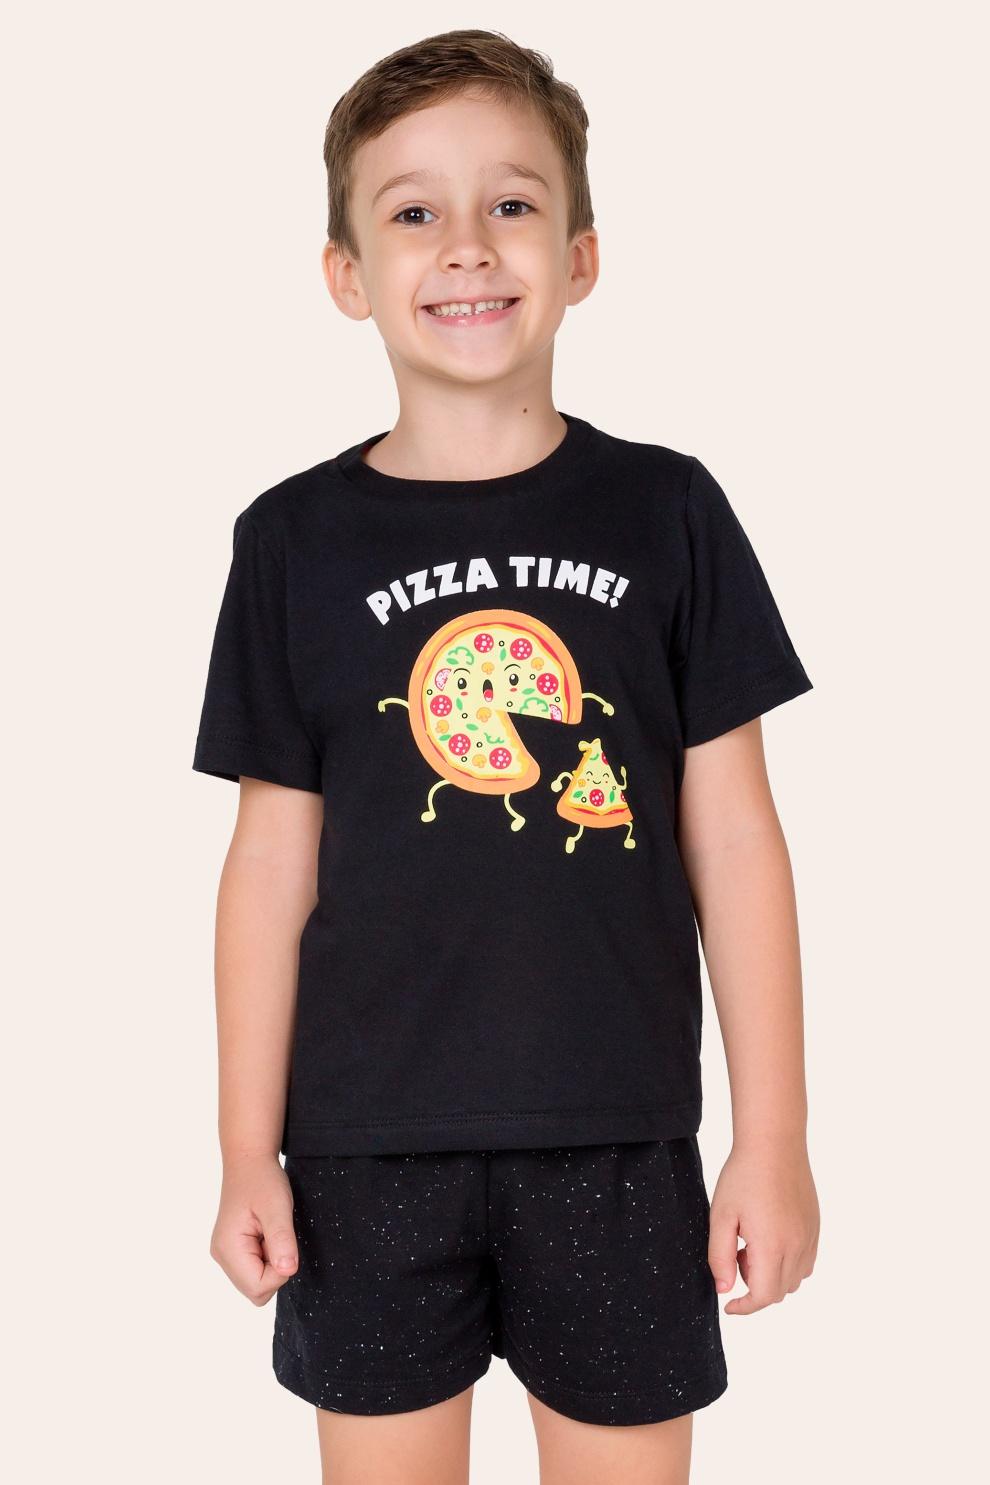 041/F - Pijama Infantil Masculino Pizza Time - Família